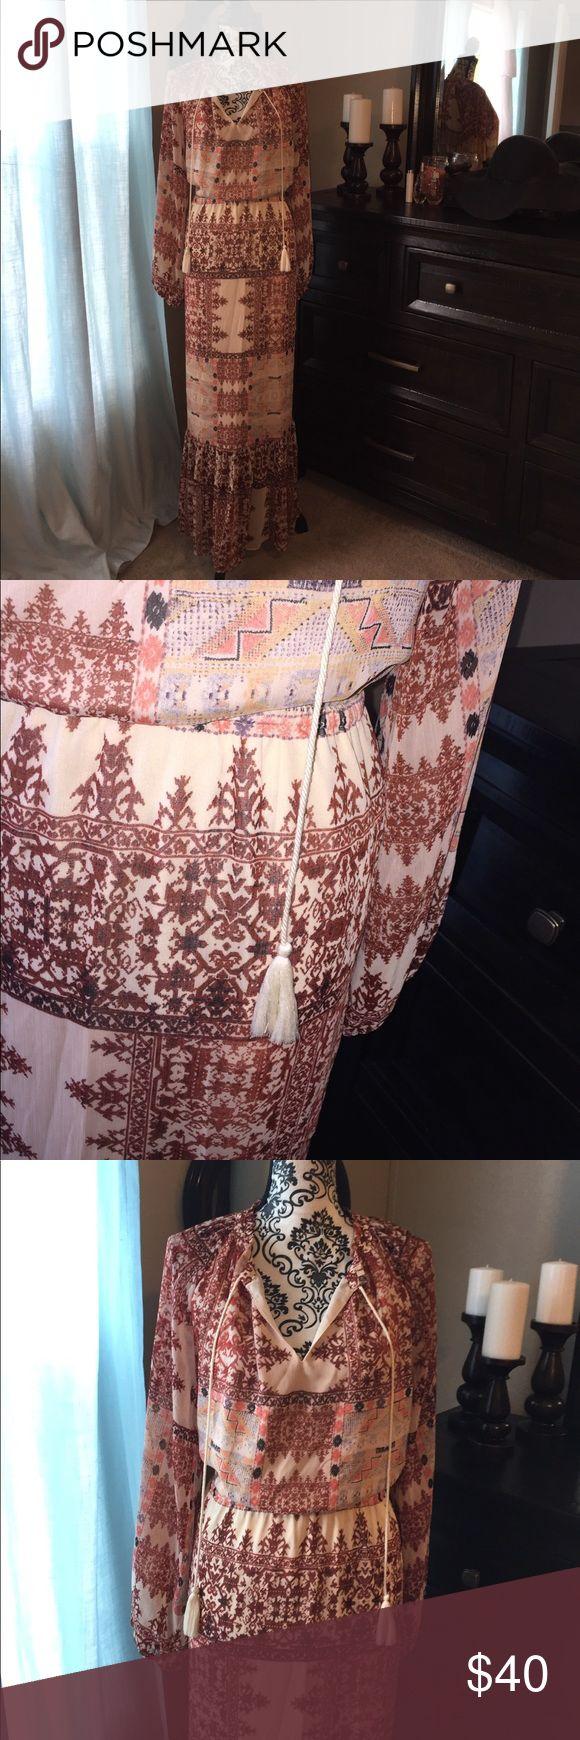 Boho Dream Dress!! Cream & Rust Tribal Maxi Dress Size XL. Lined to mid calf. Elastic Waist. Tassel neck. Ruffled hem. Boho chic. Tribal and floral print. Dresses Maxi